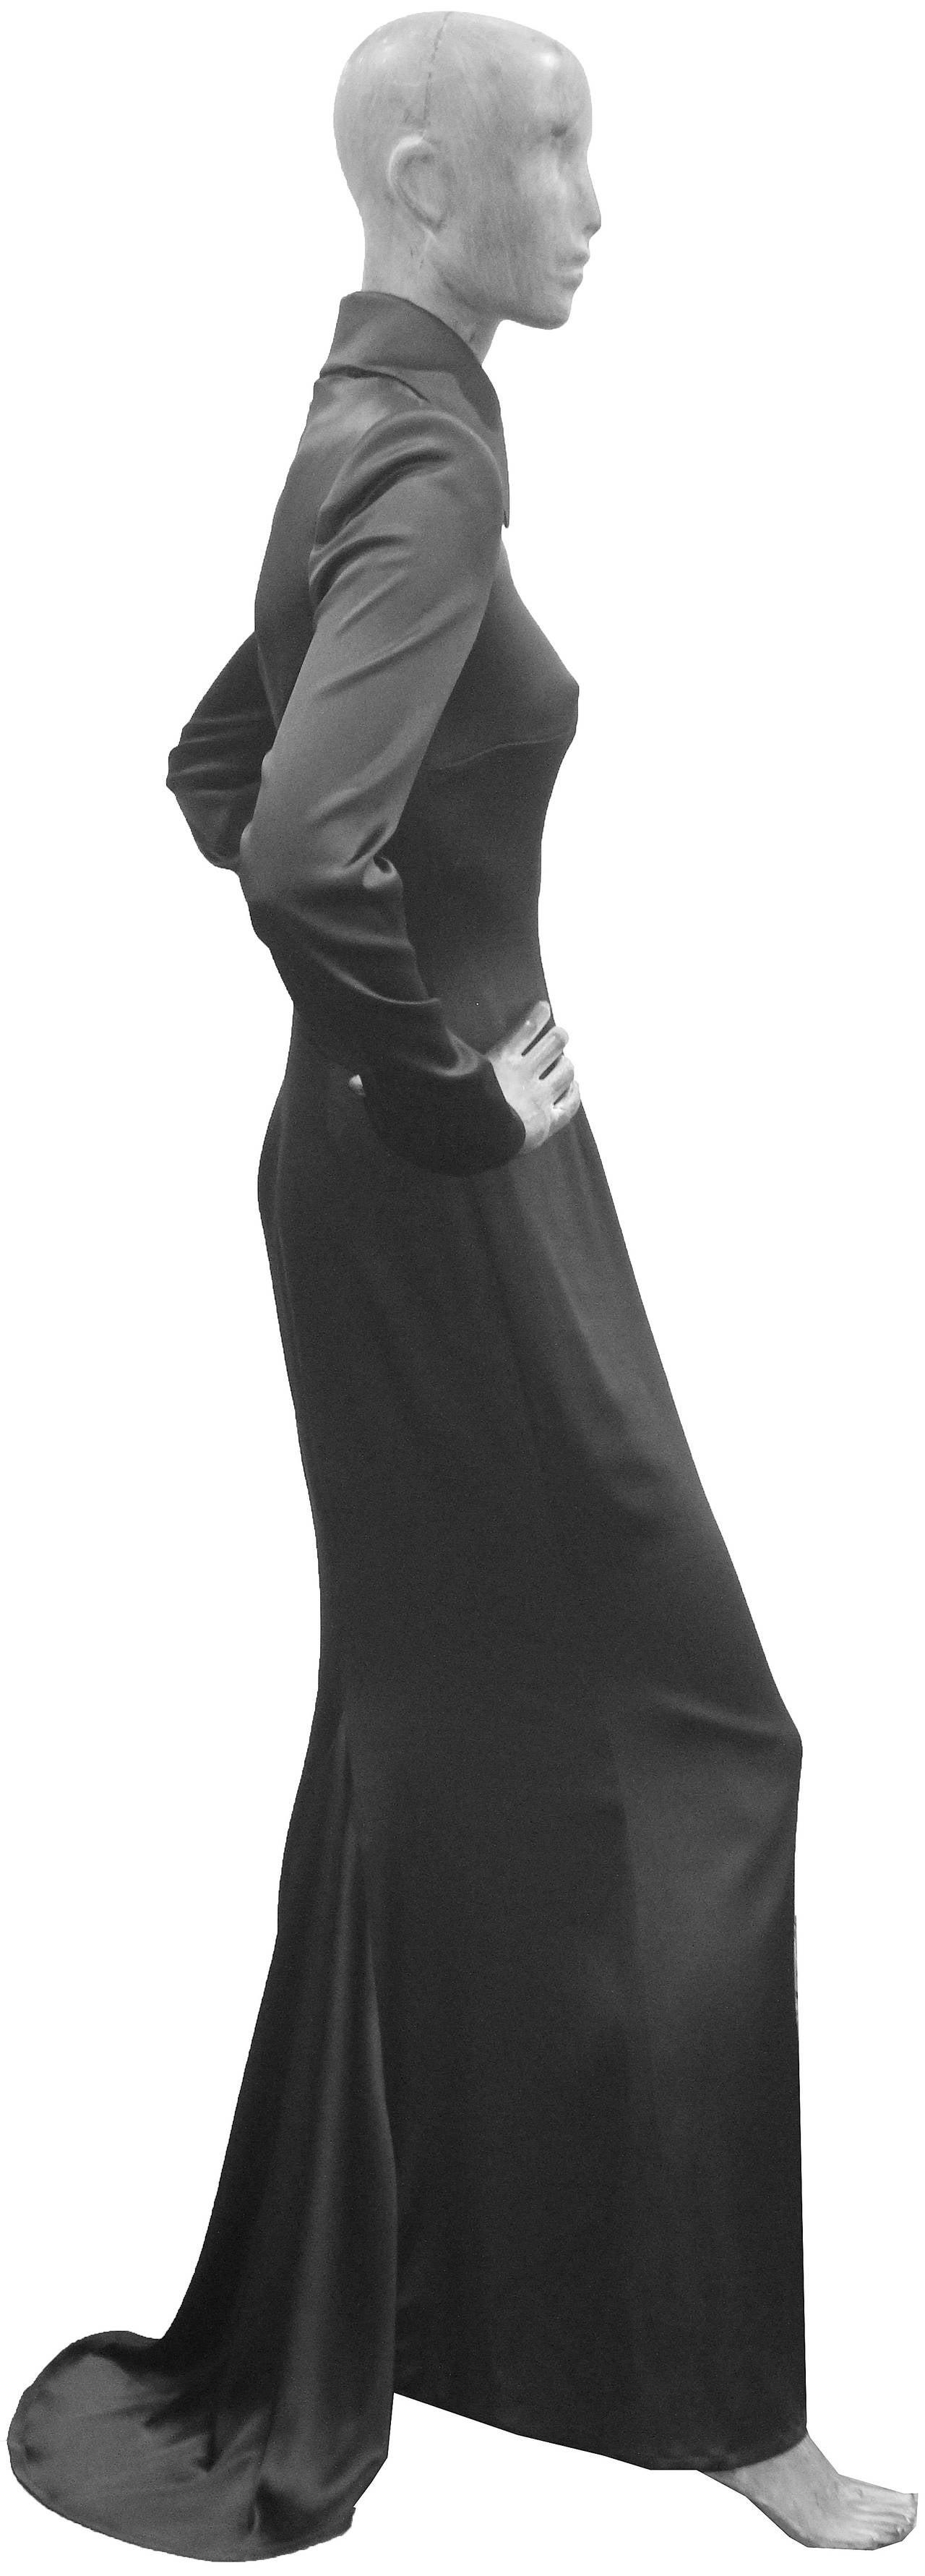 1990s Givenchy by Alexander McQueen Black Silk Evening Dress (Unworn) 3